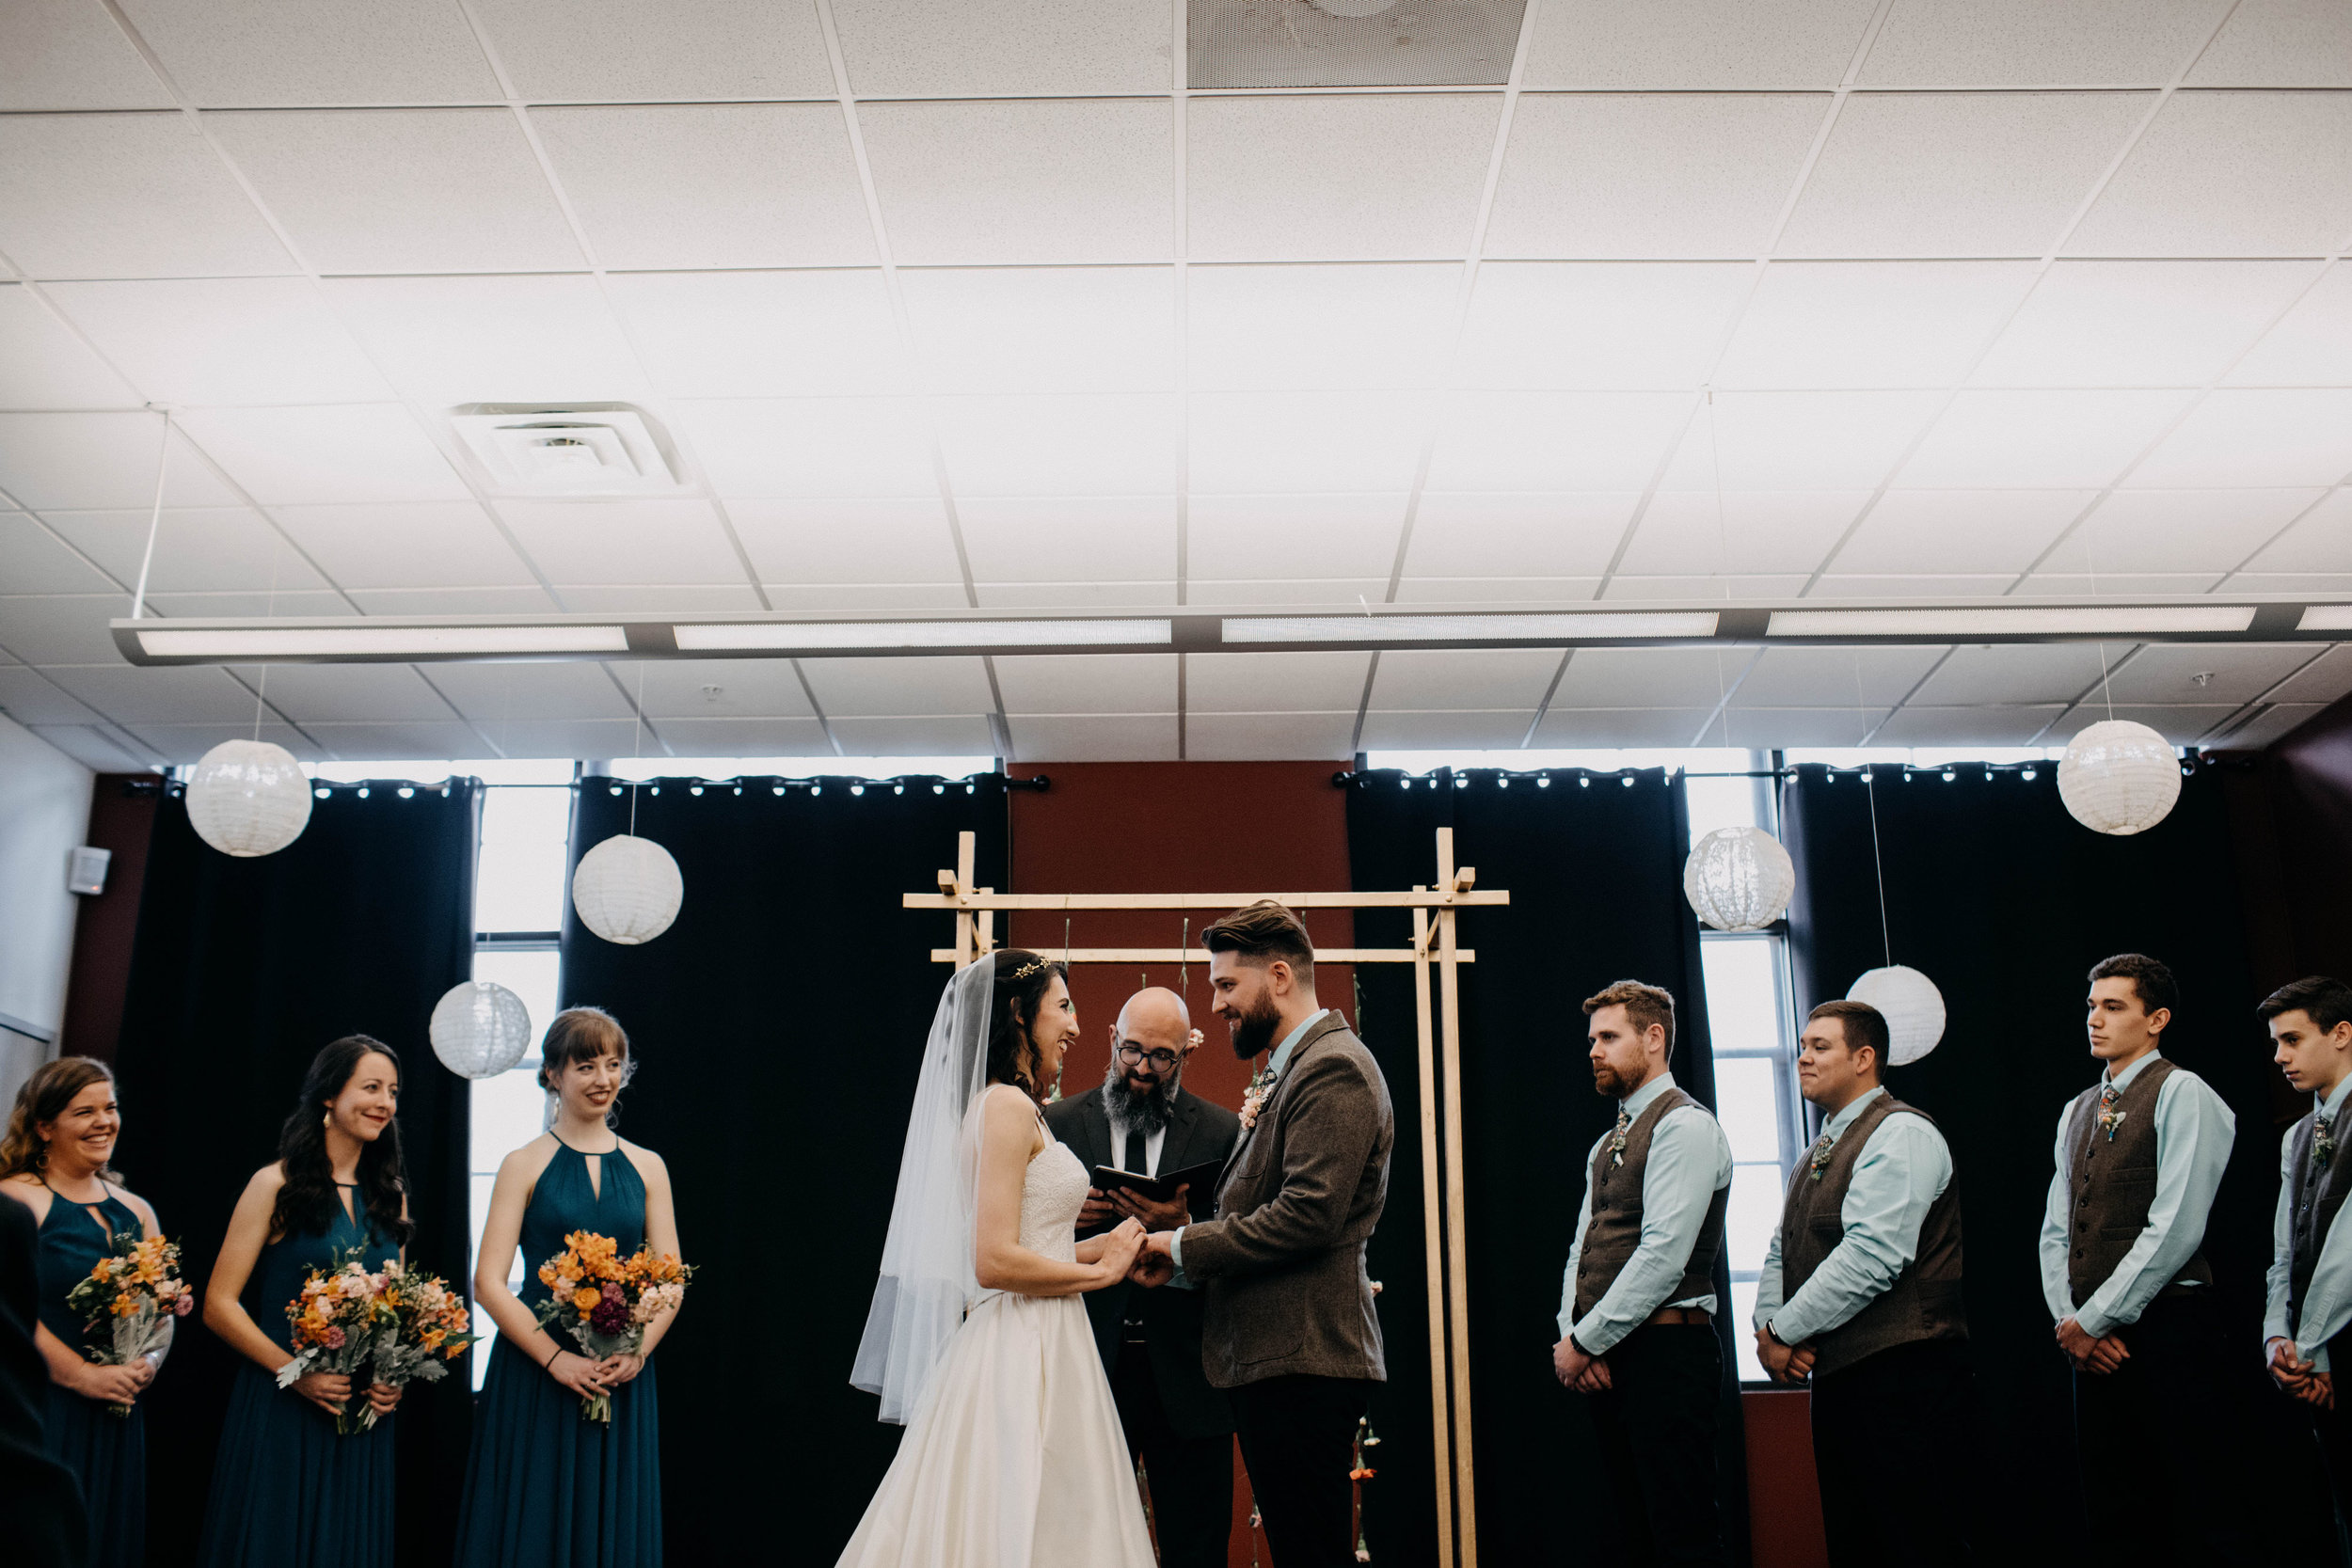 Columbus, Ohio Wedding Photographer Everal Barn At Heritage Park Wedding Venue Grace E Jones Photography50.jpg